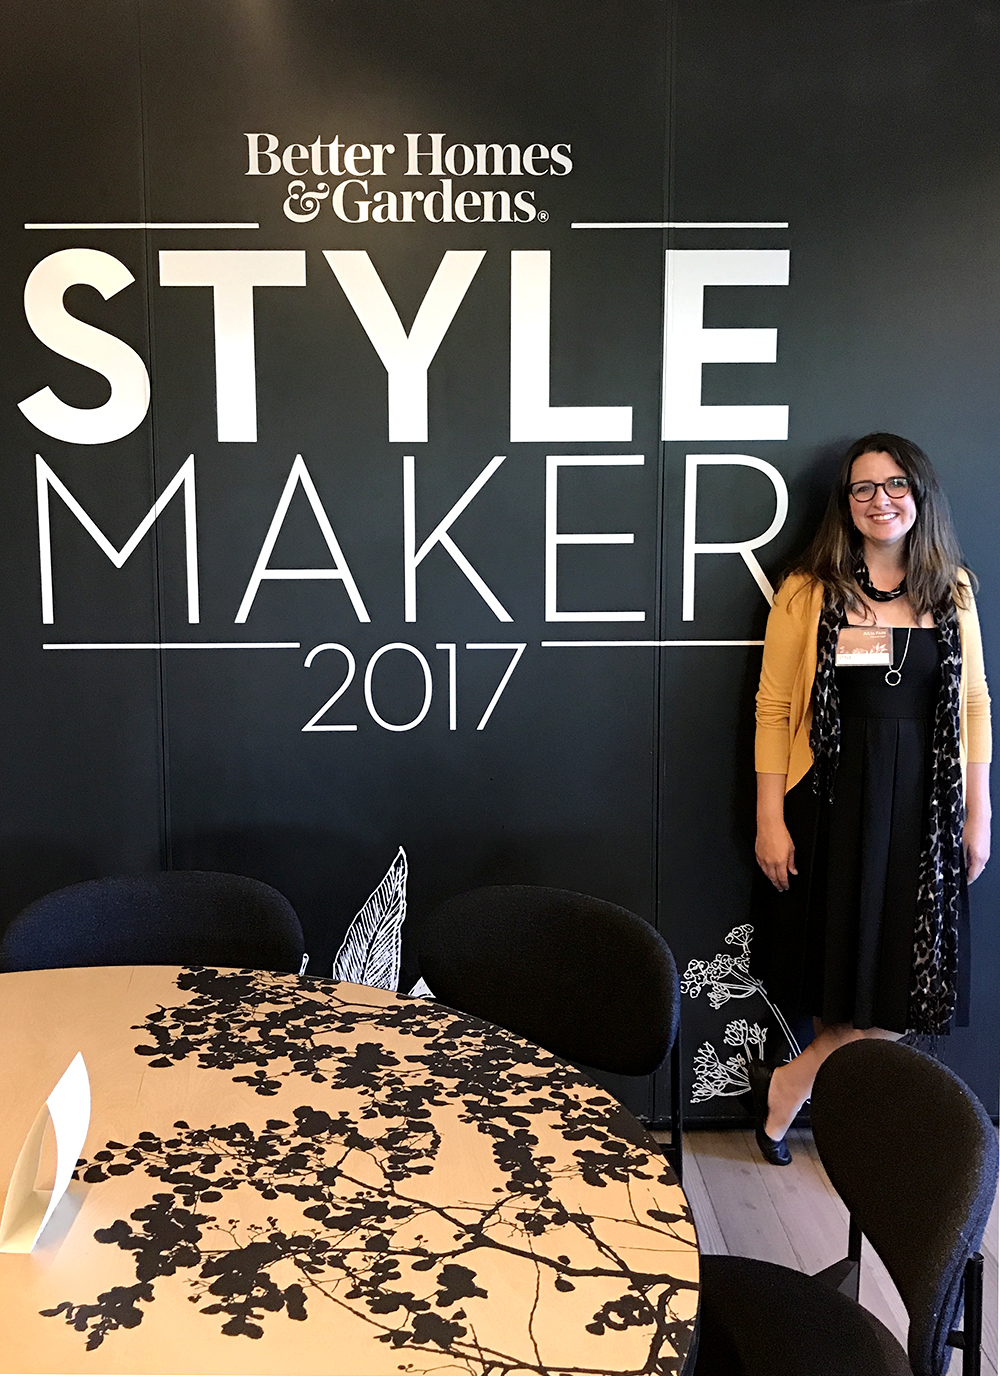 Julia Fain at BHG Stylemaker 2017